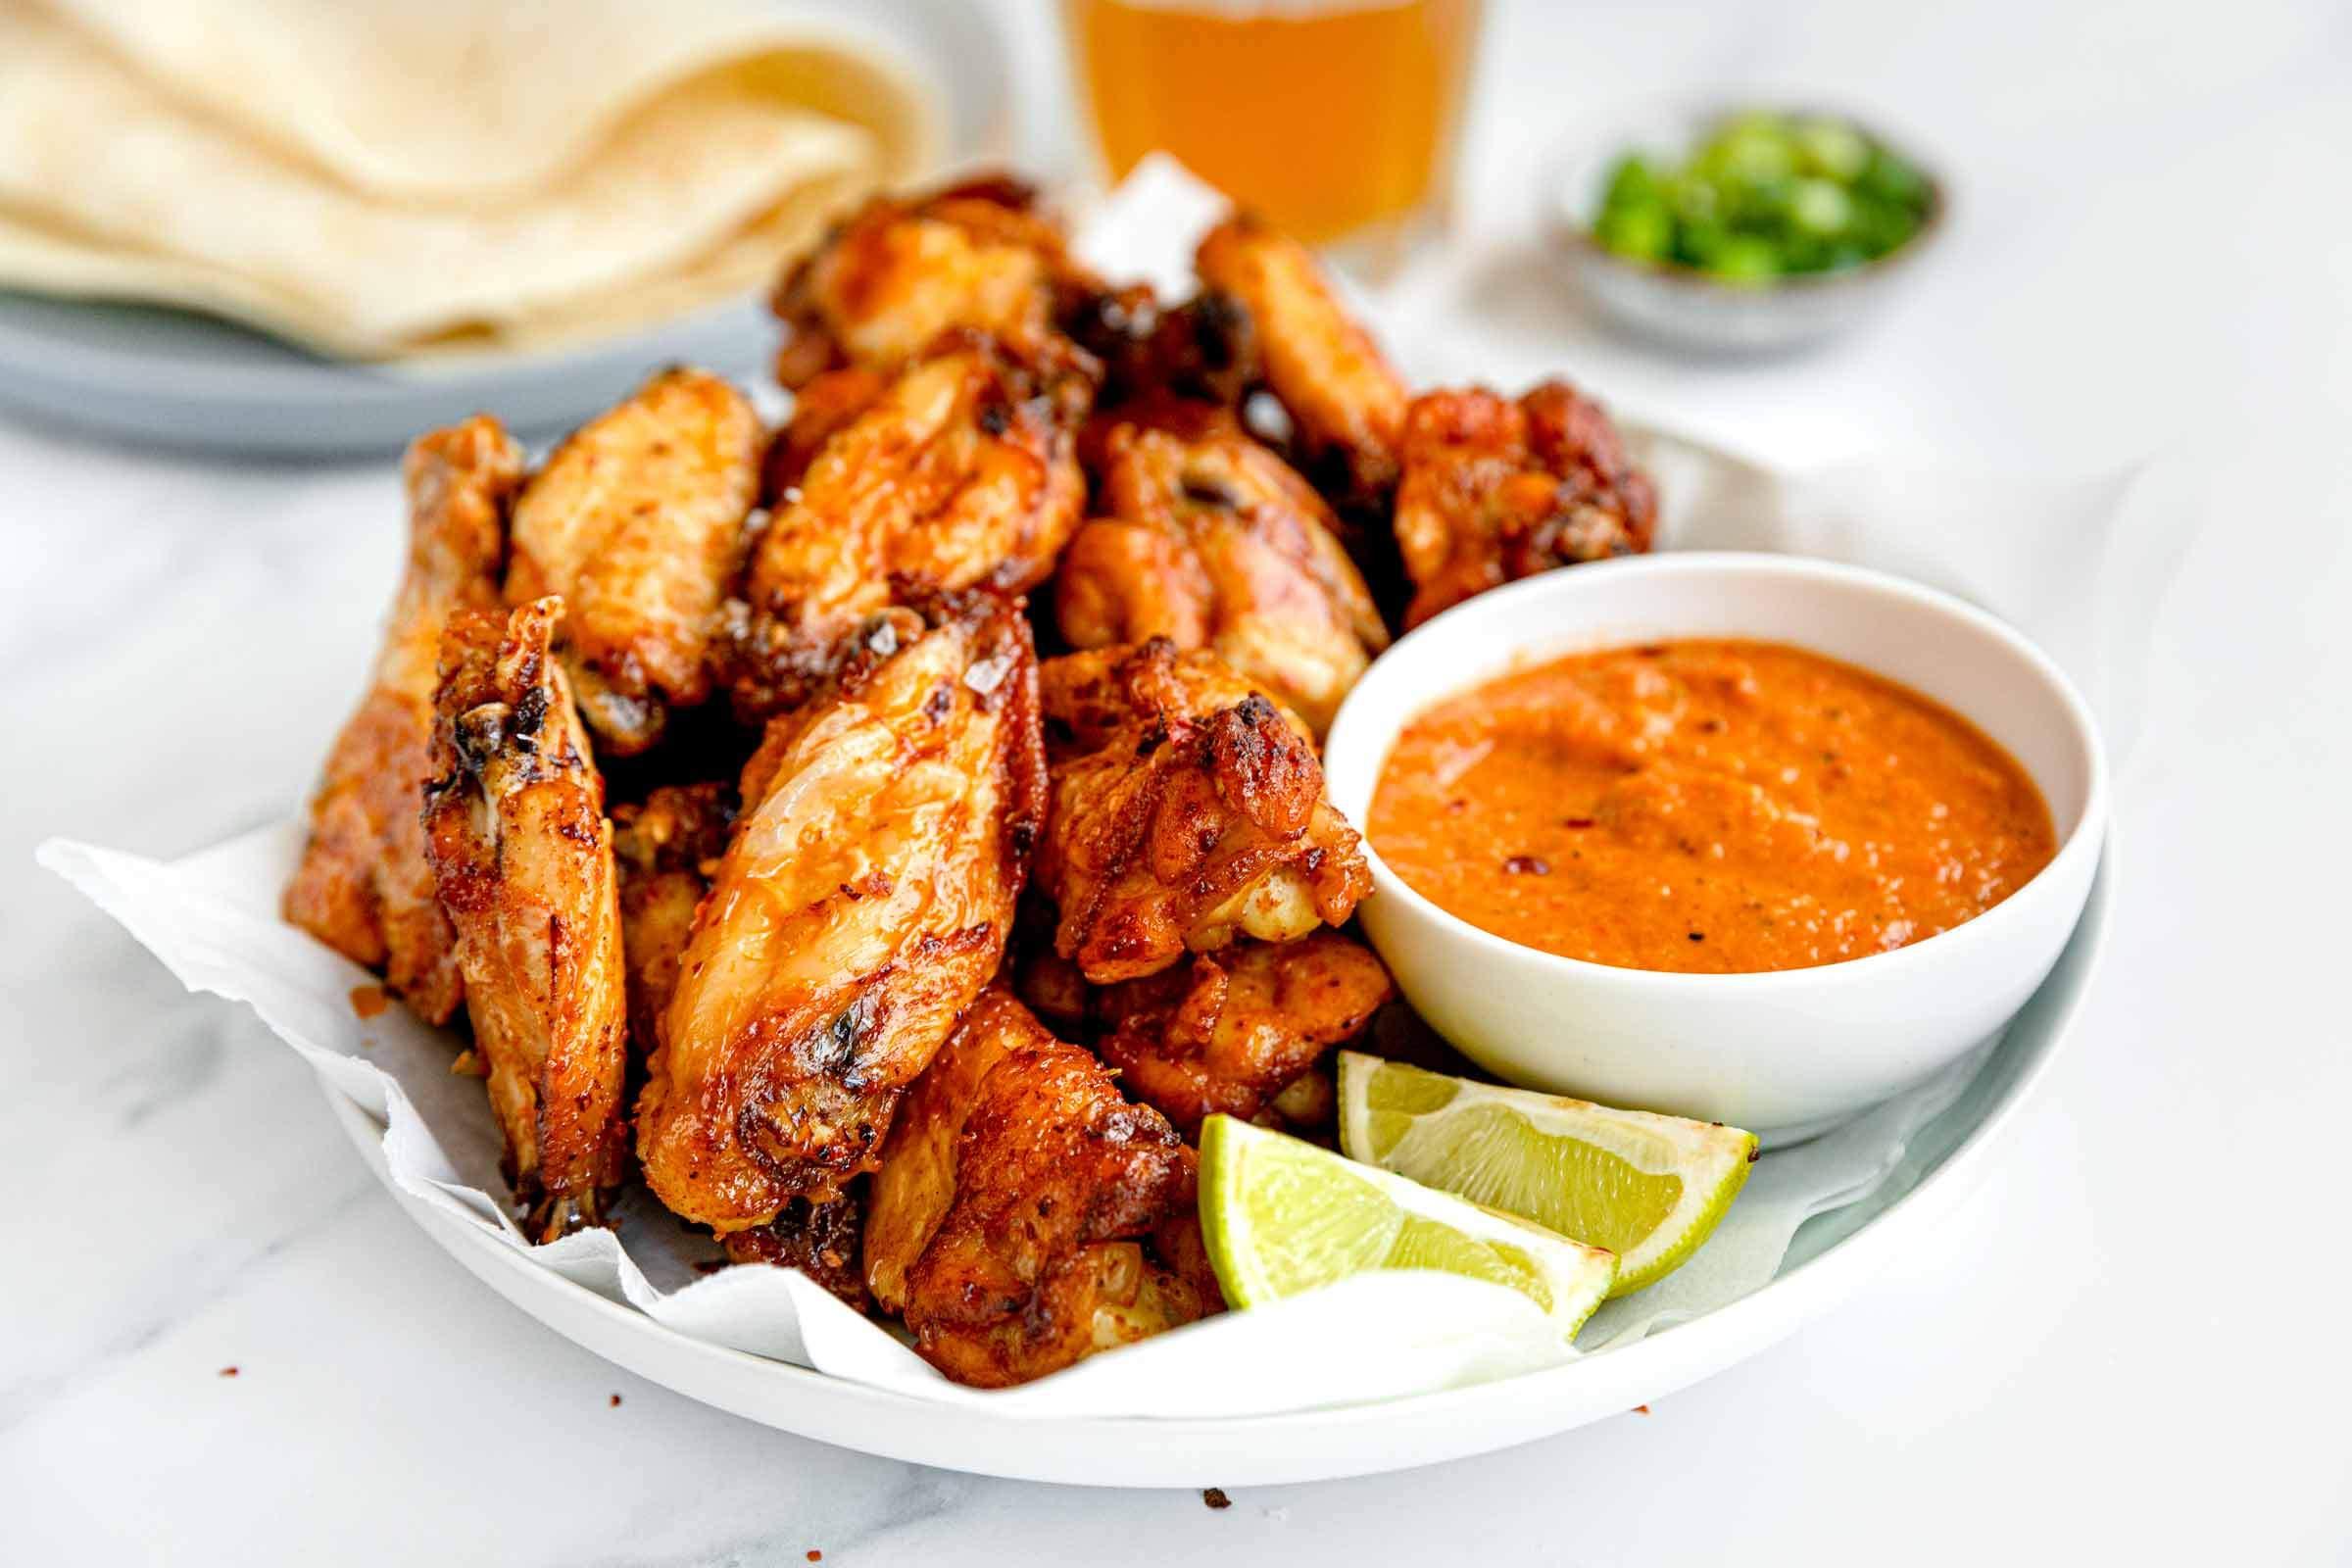 Smoked Paprika Chicken Wings